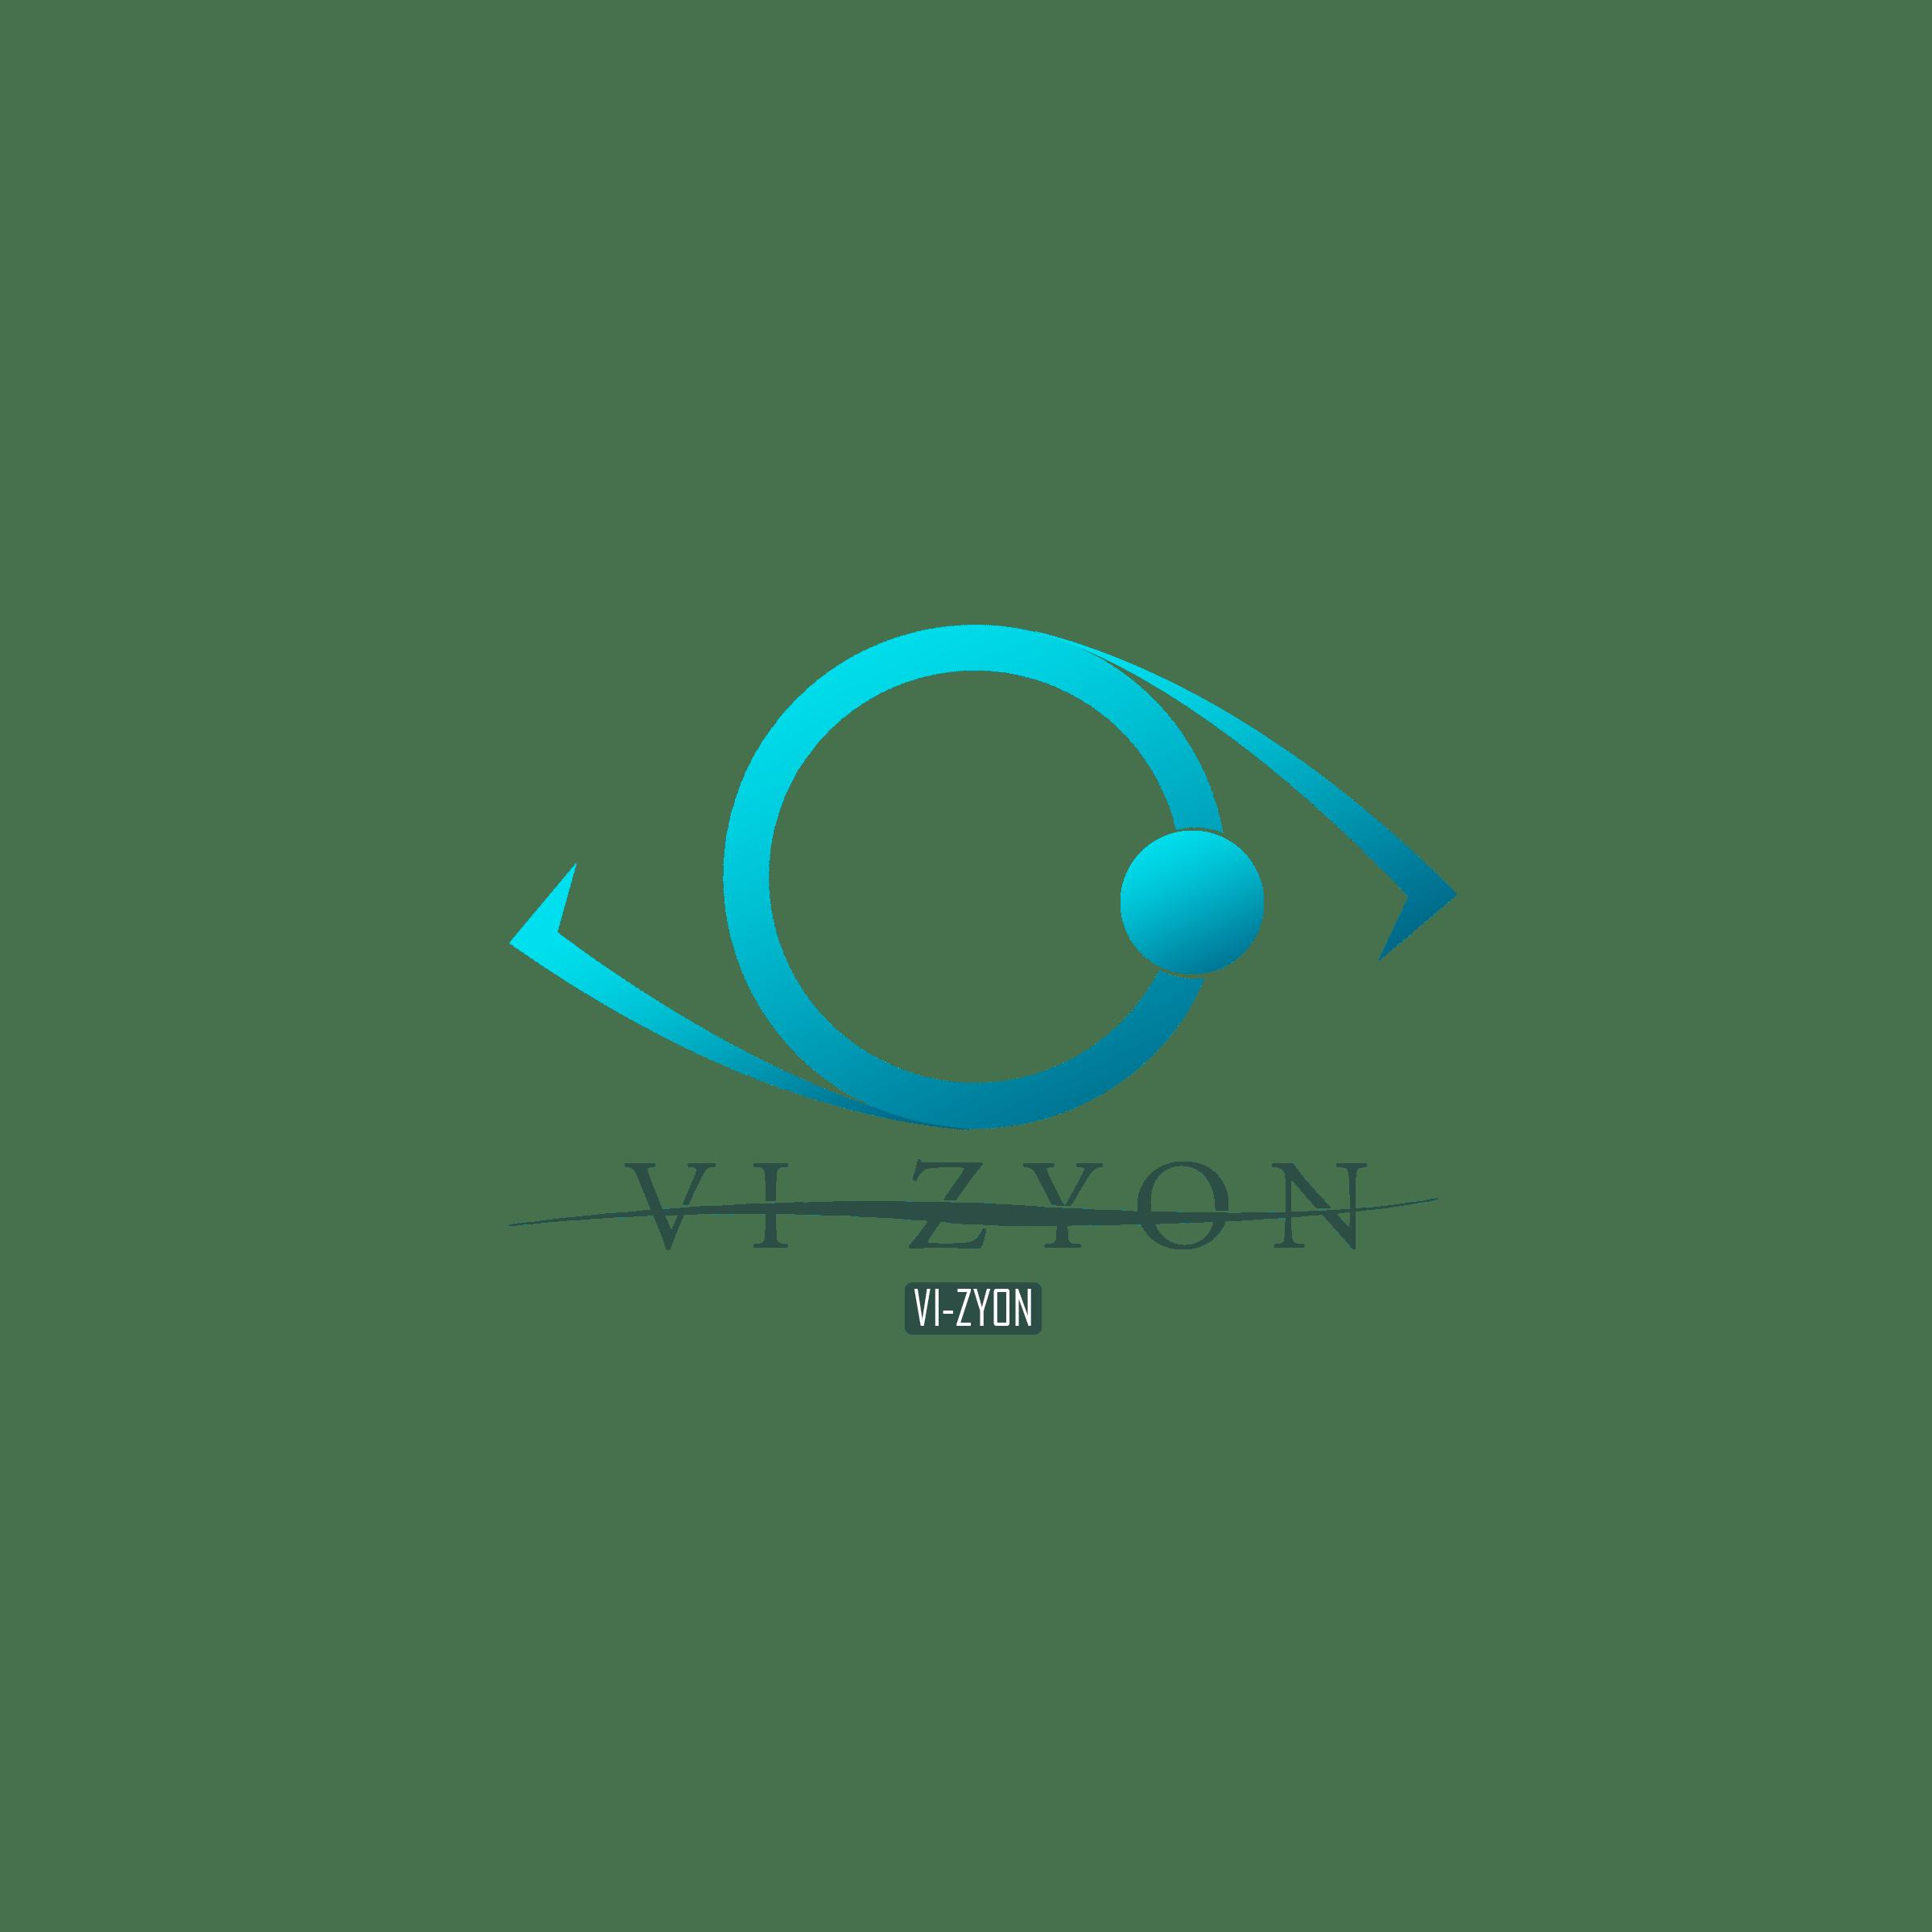 Geek Digital Client Vi-Zyon